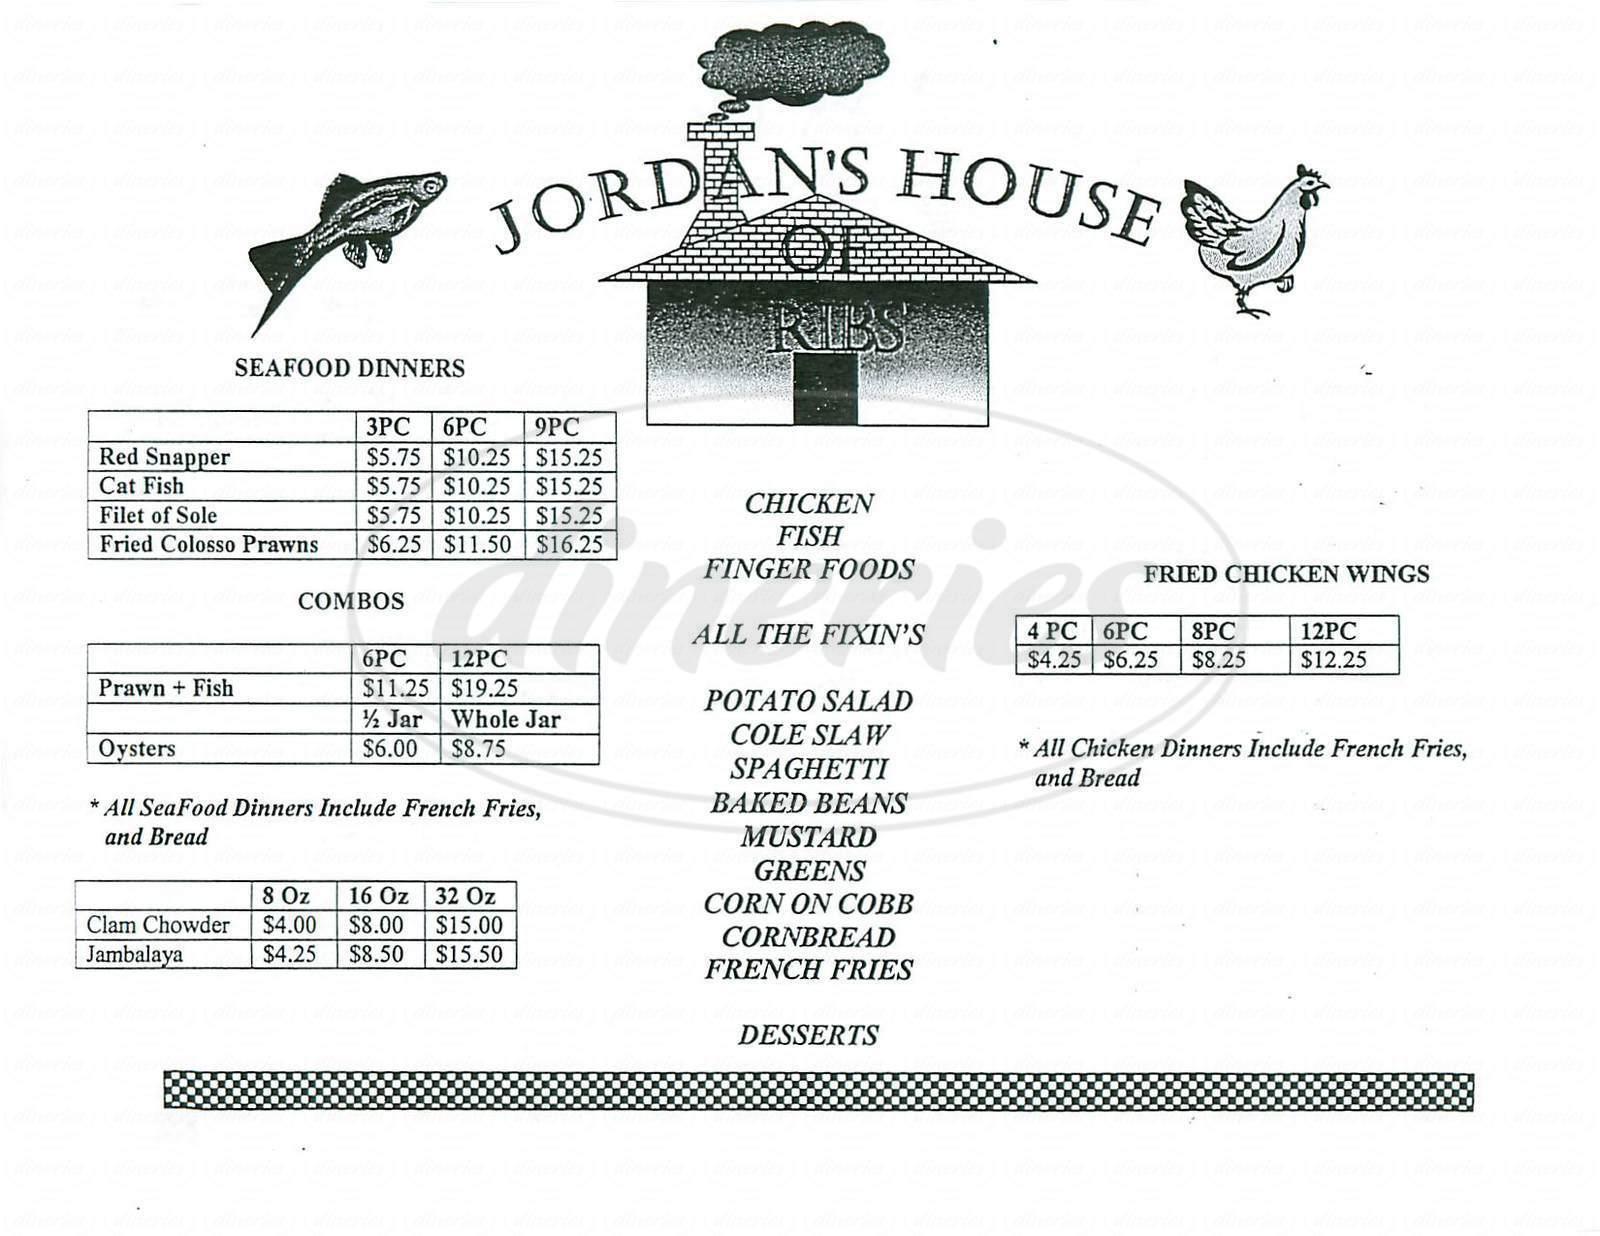 menu for Jordans House of Ribs